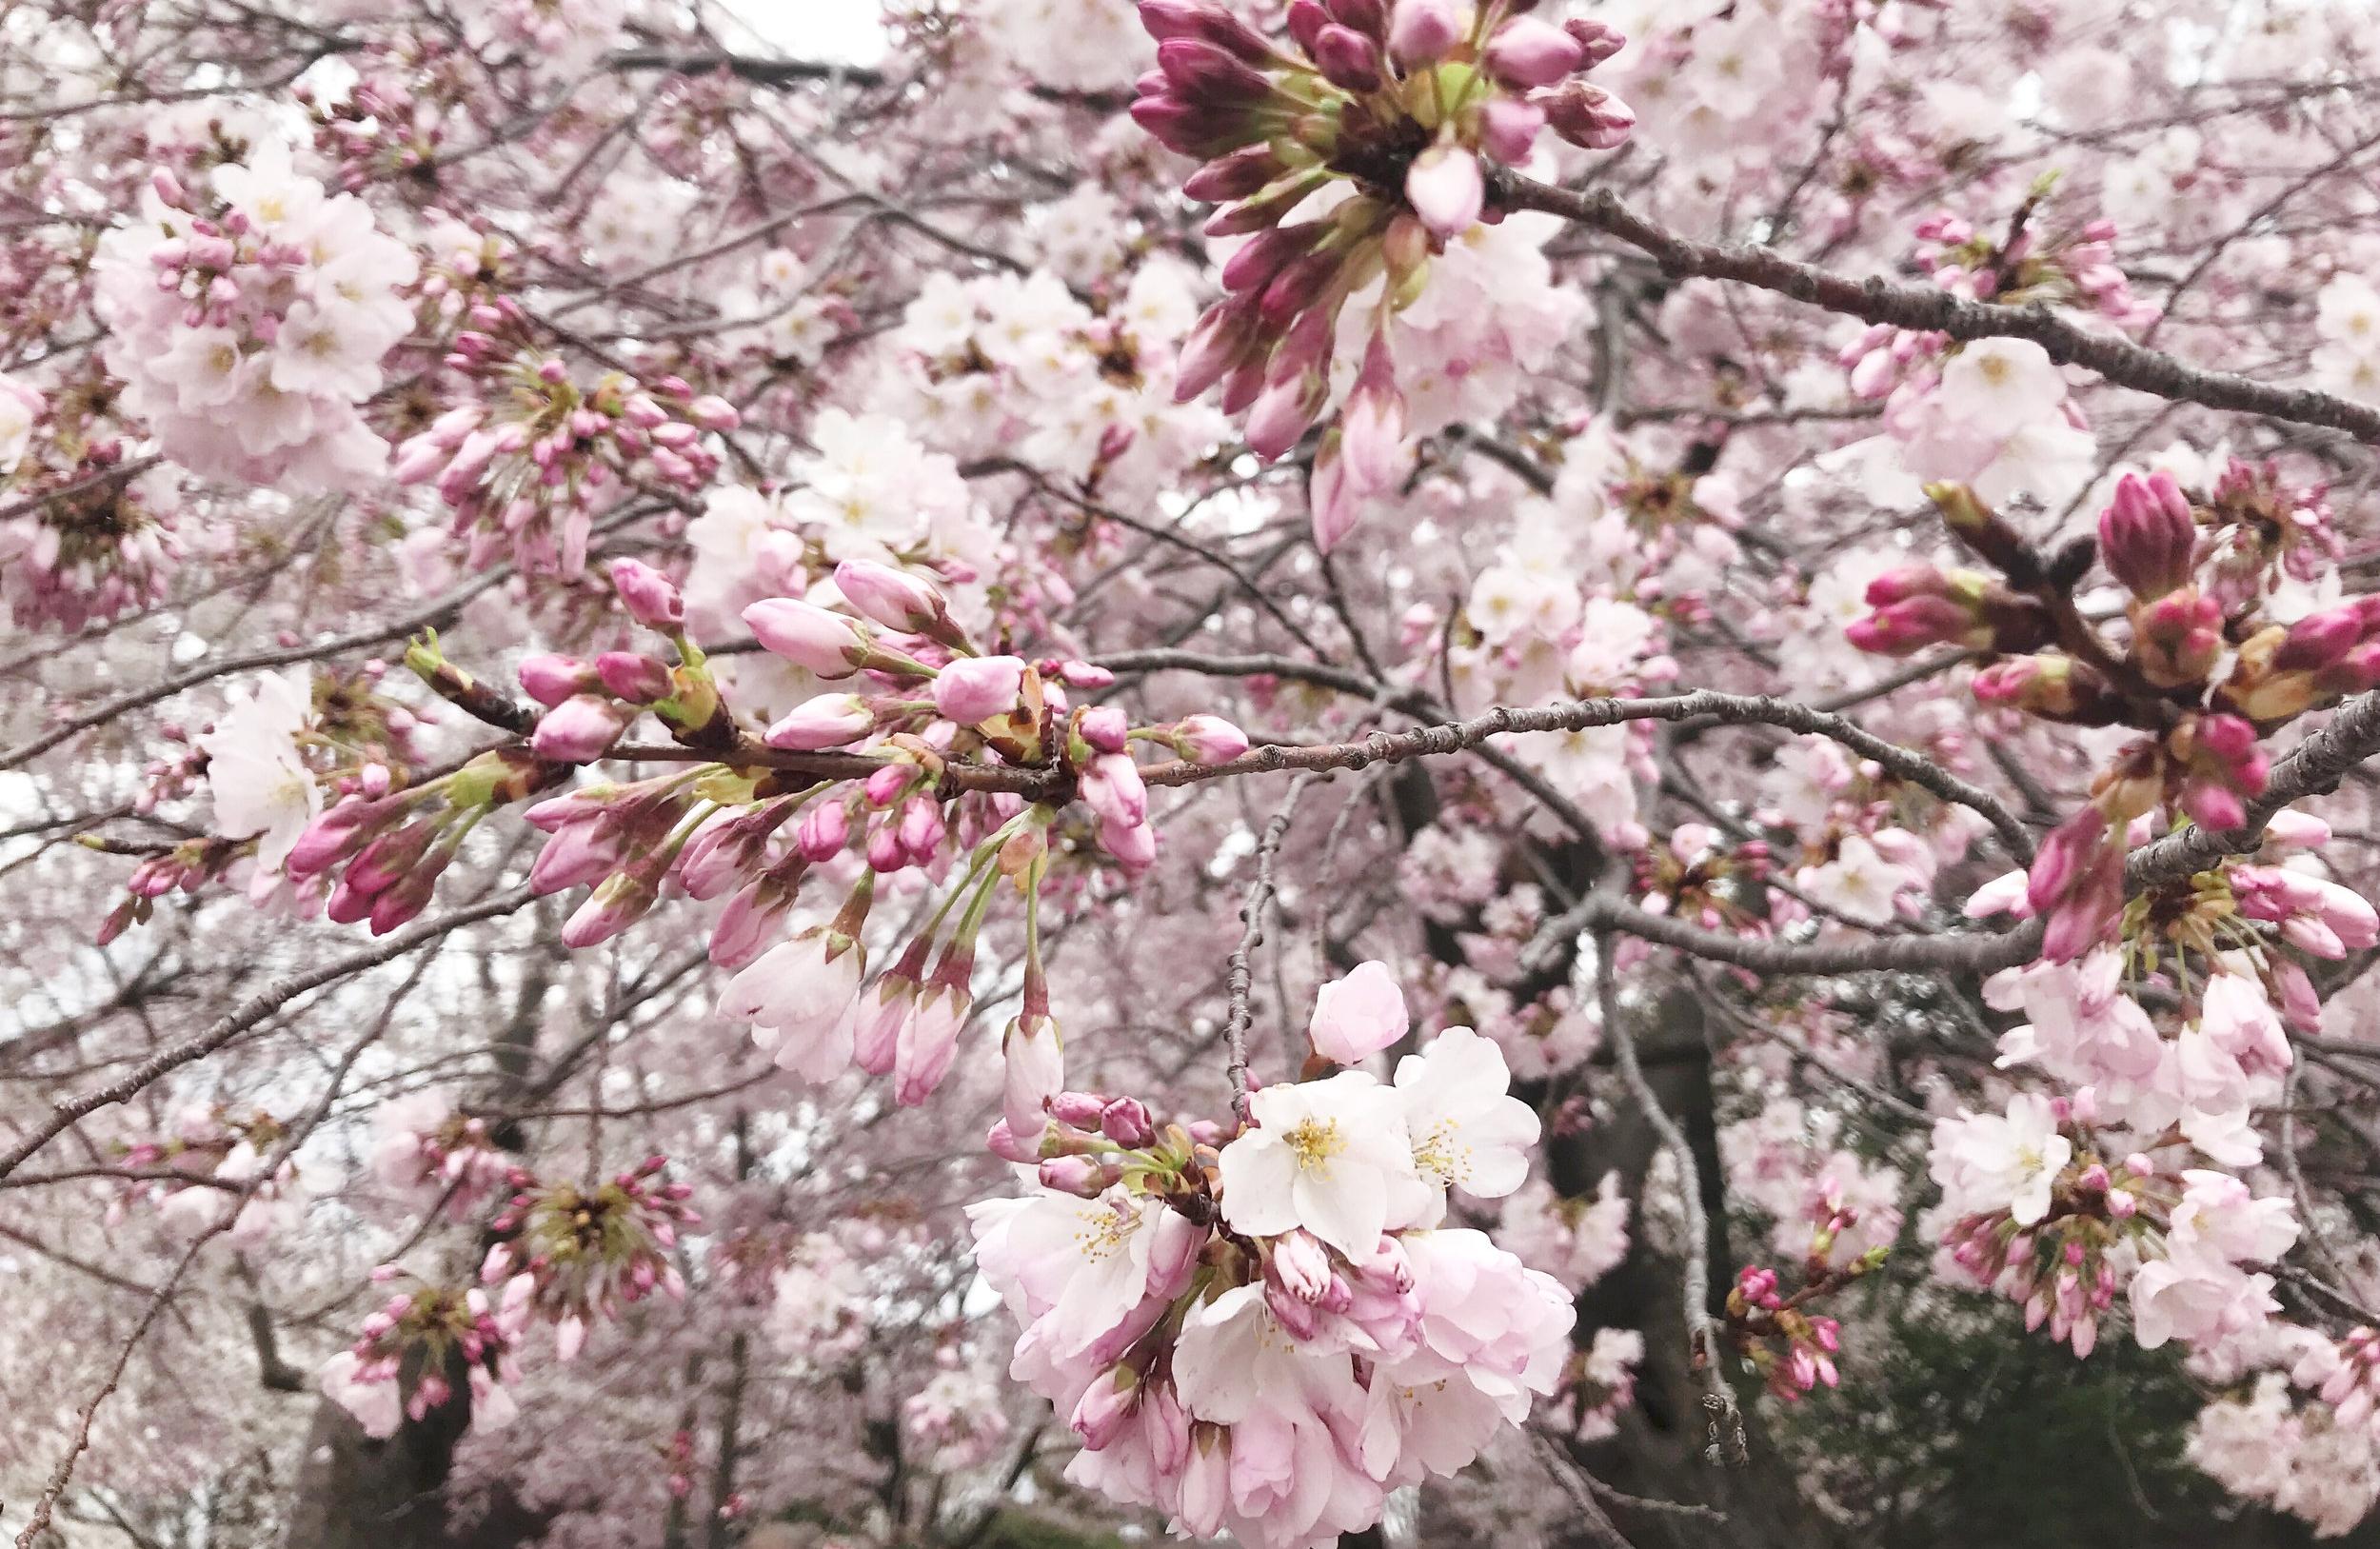 dc-cherry-blossoms-nora-knox-2.jpg